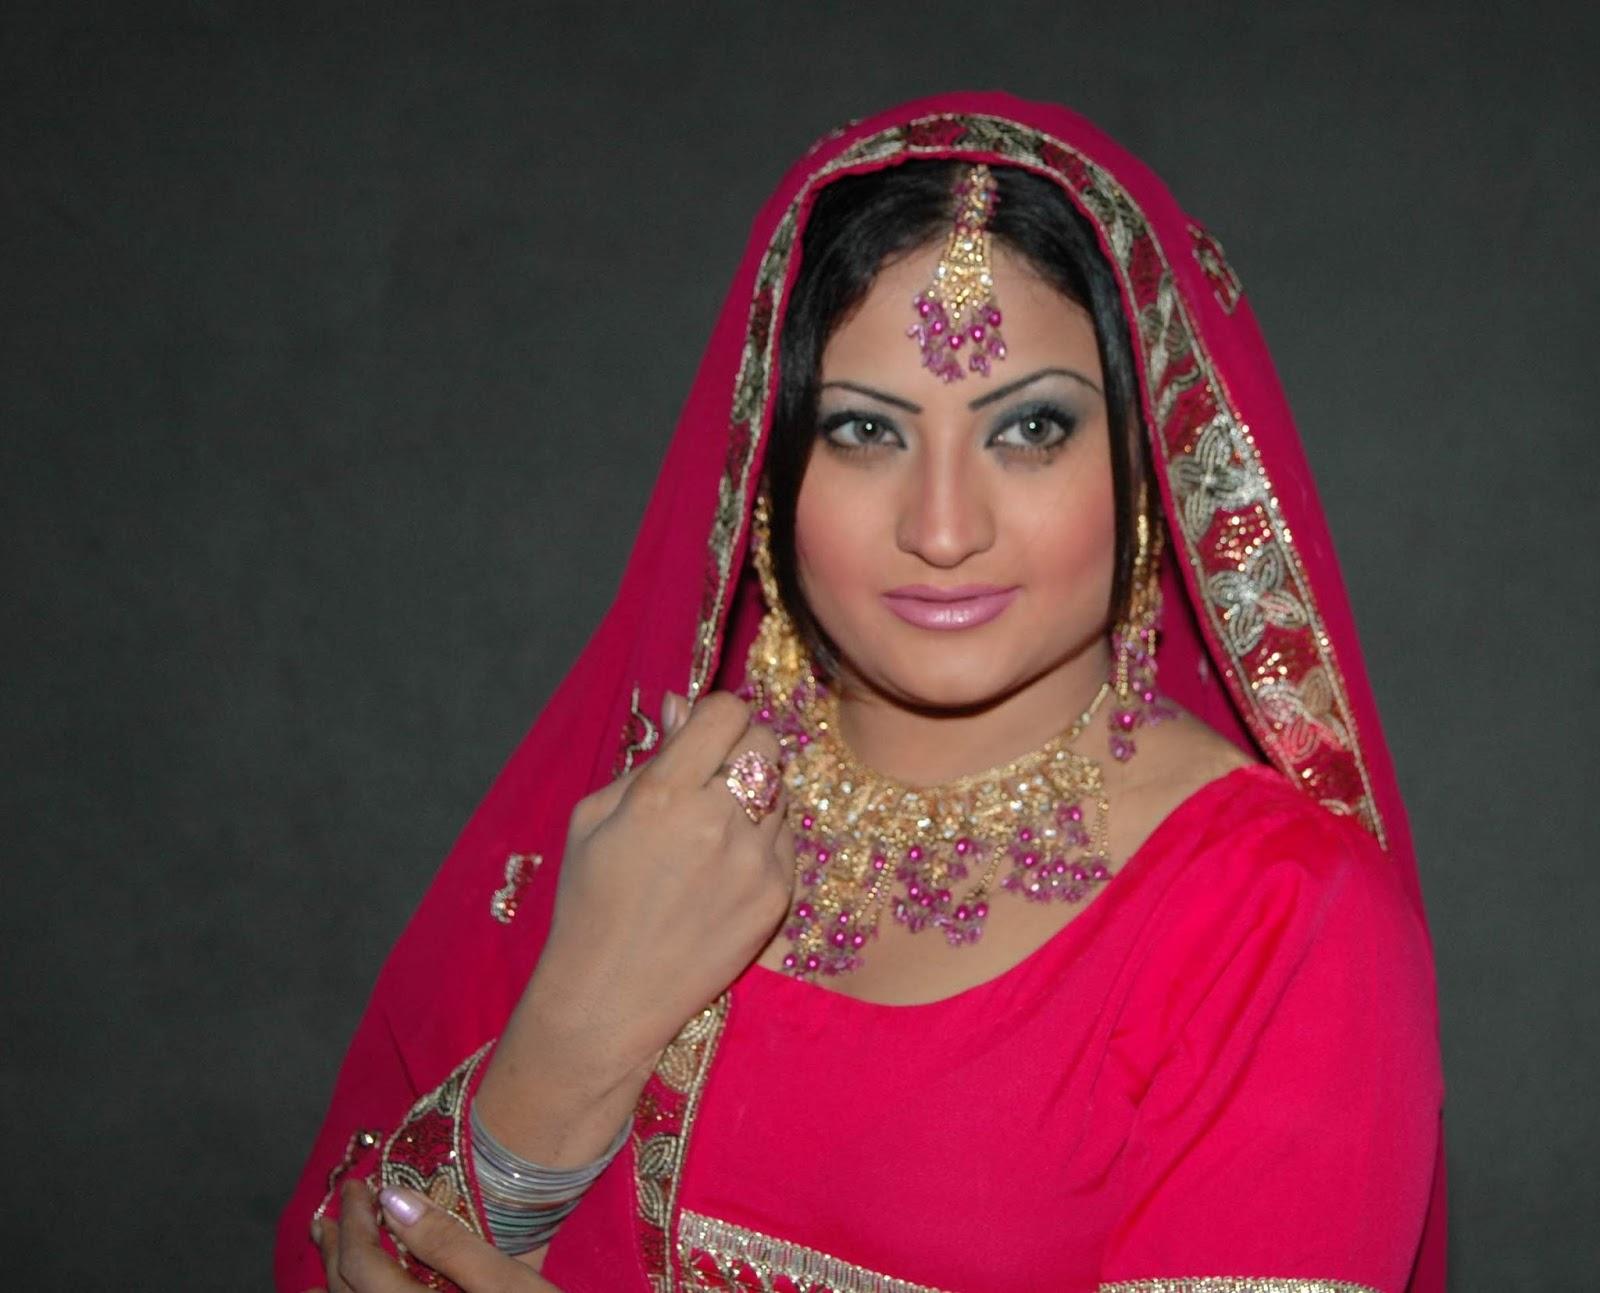 pashto girls adult photo